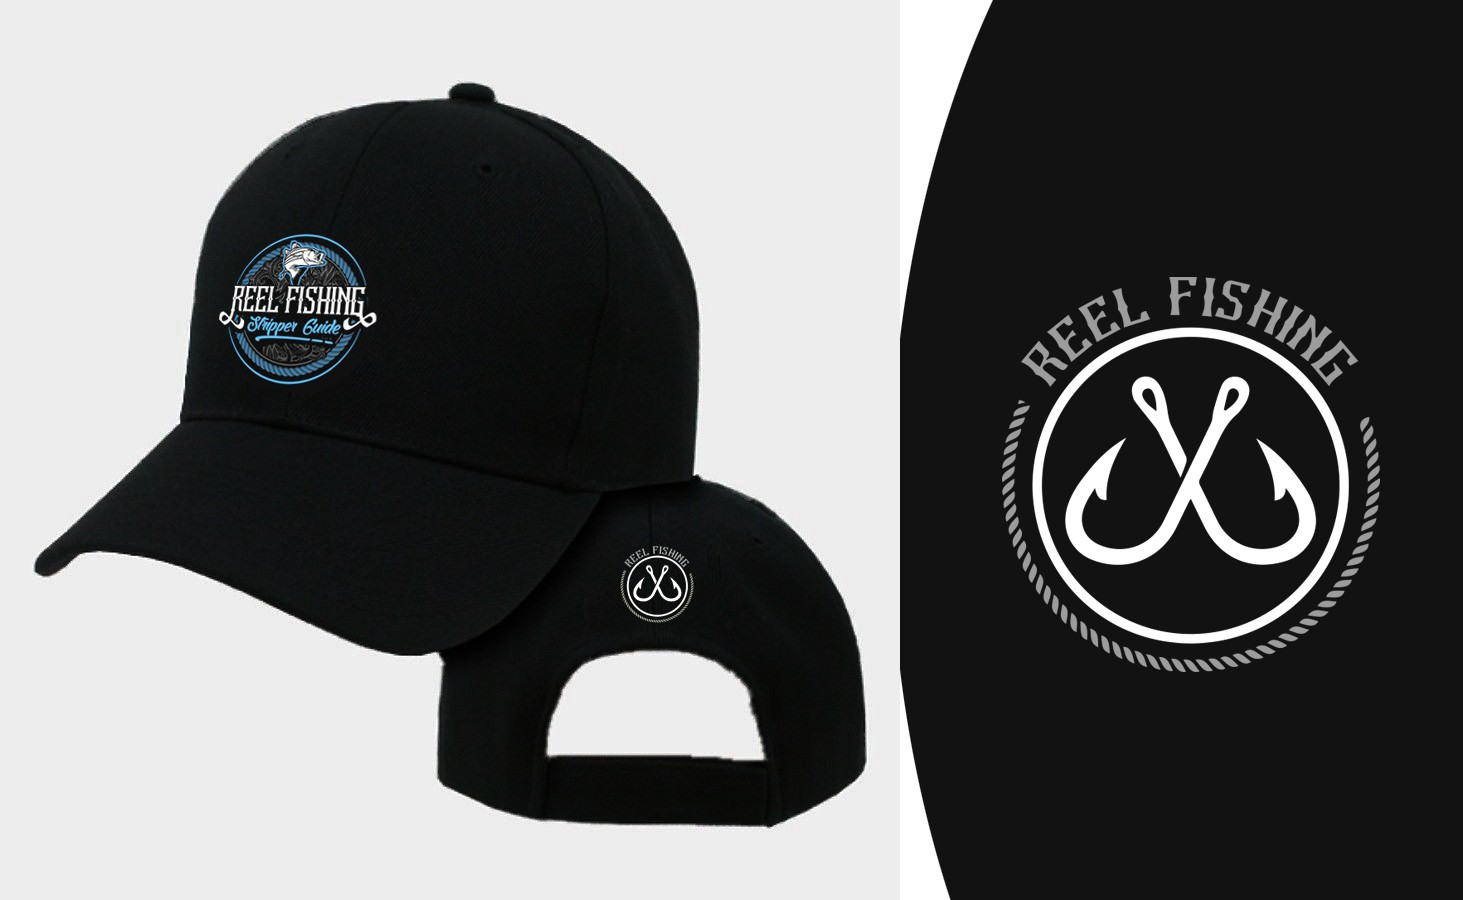 New hat for Reel Fishing Striper Guide